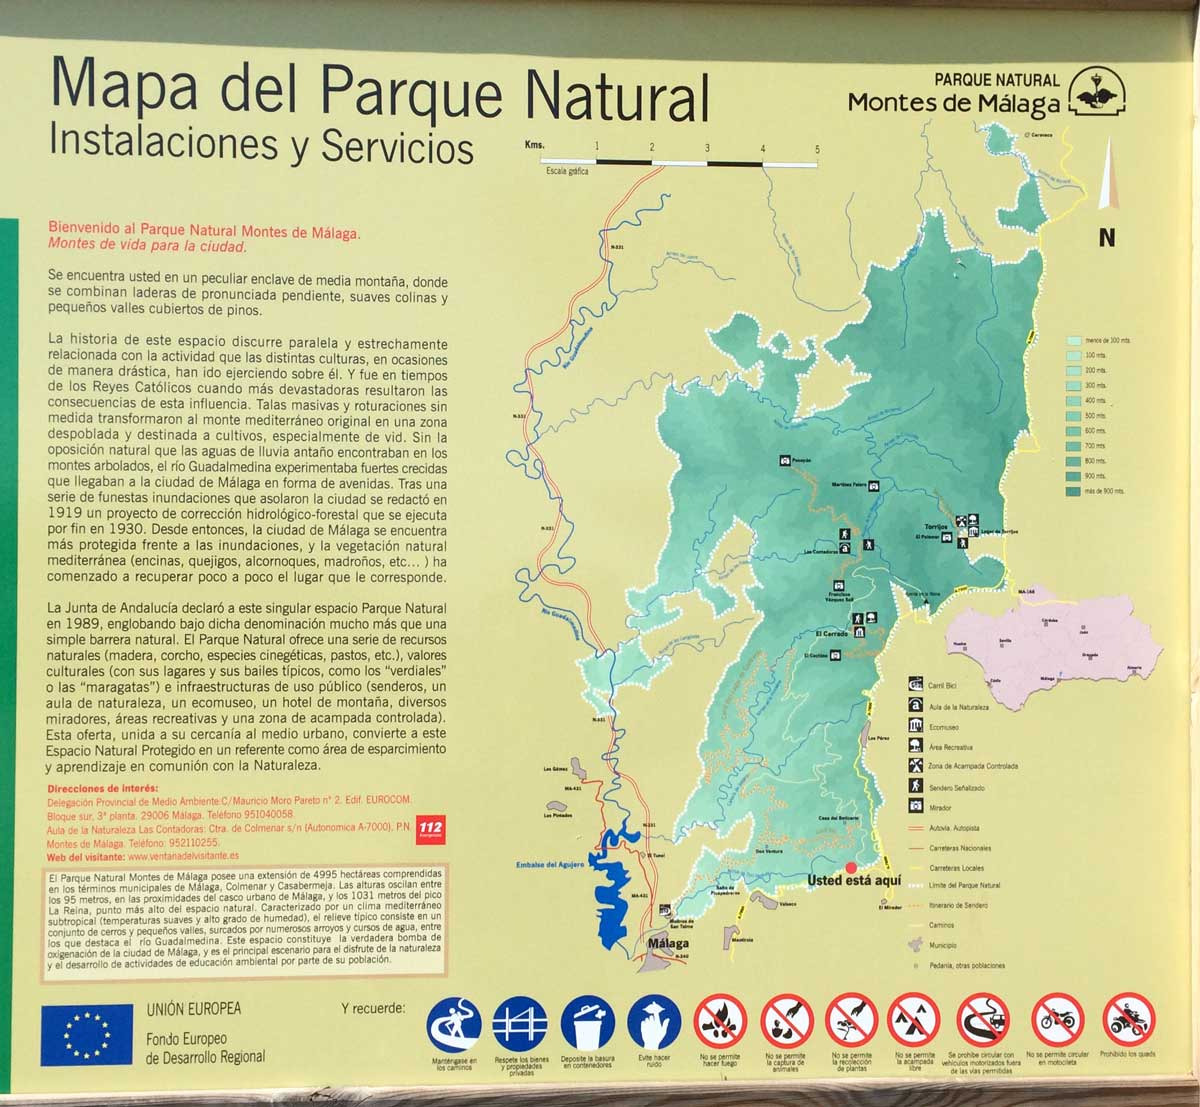 Wandern in den Montes de Malaga